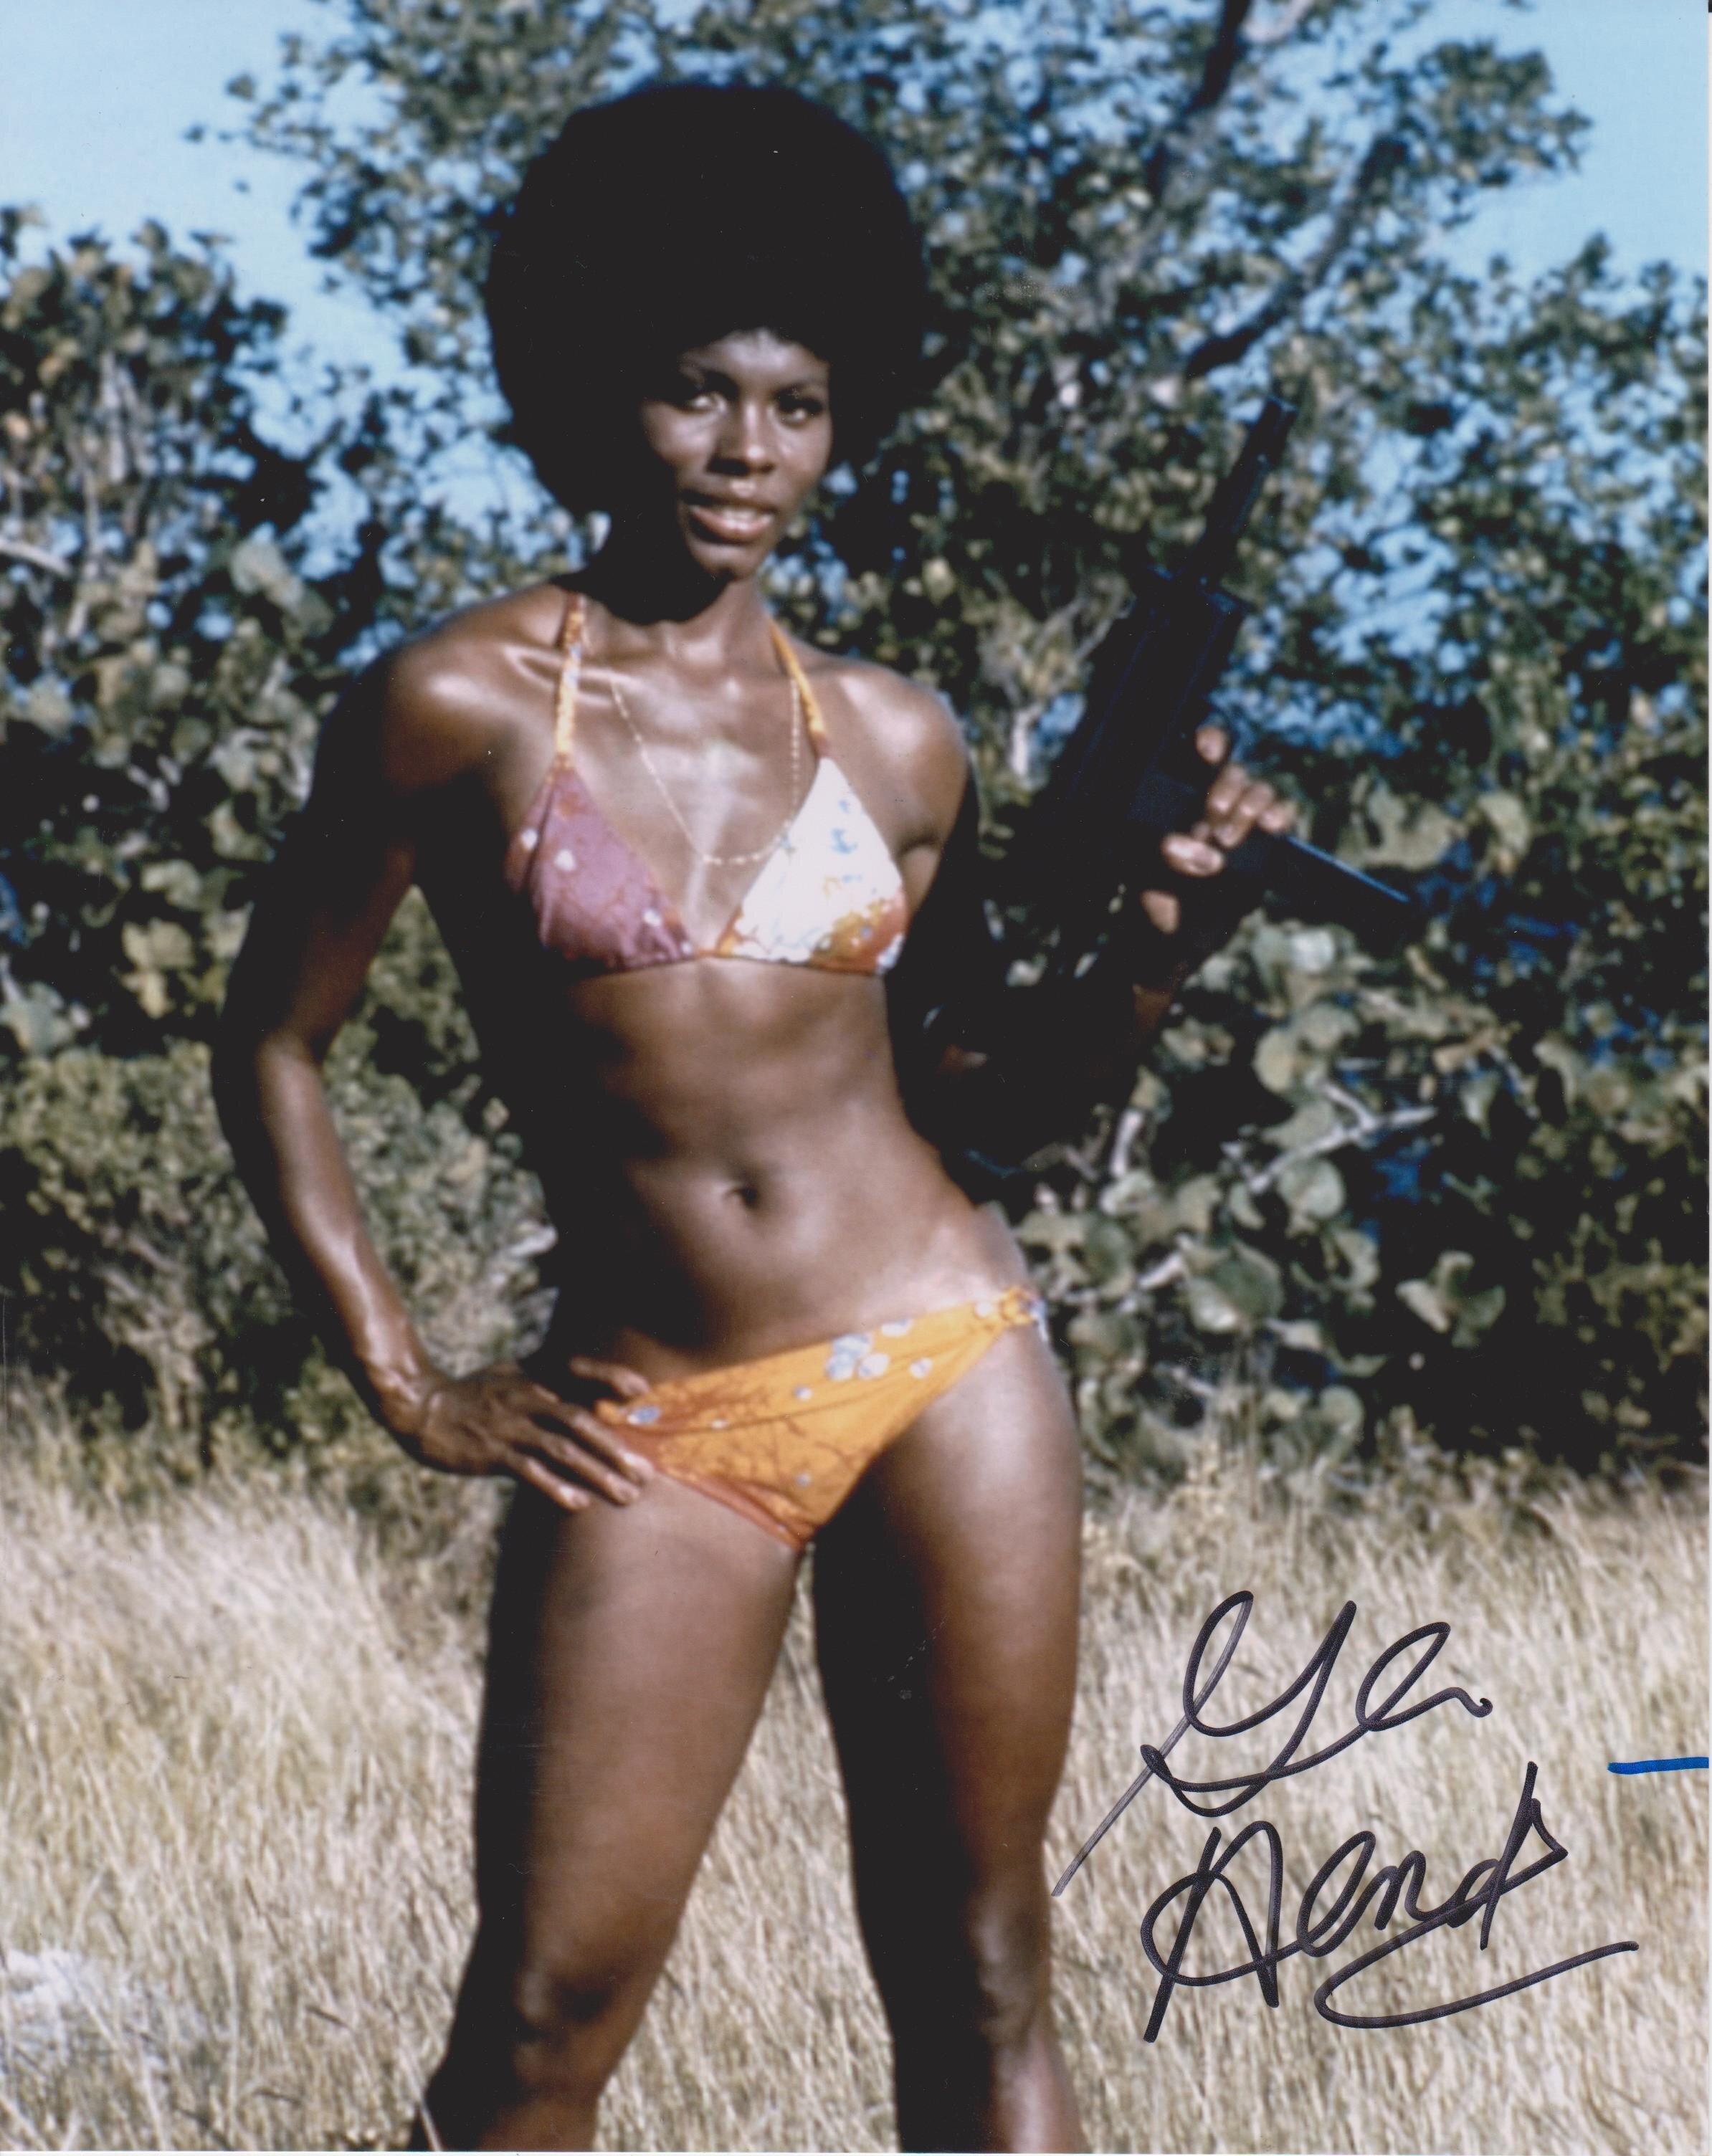 Olivia Thirlby,Carmen Electra United States Erotic archive Nigel Green (1924?972 (born in Pretoria, South Africa),Rachel Korine